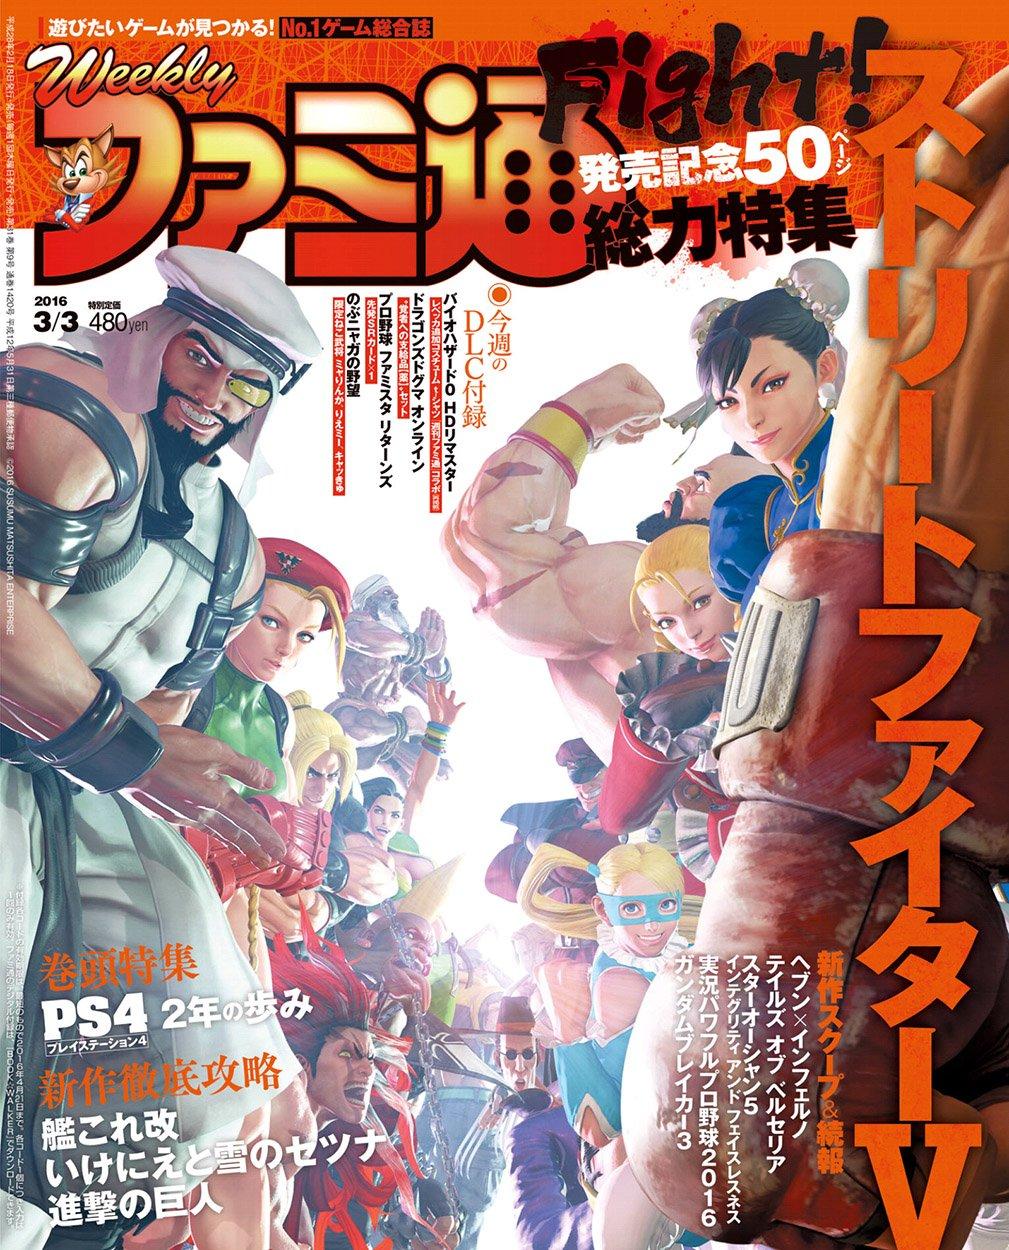 Famitsu 1420 March 3, 2016